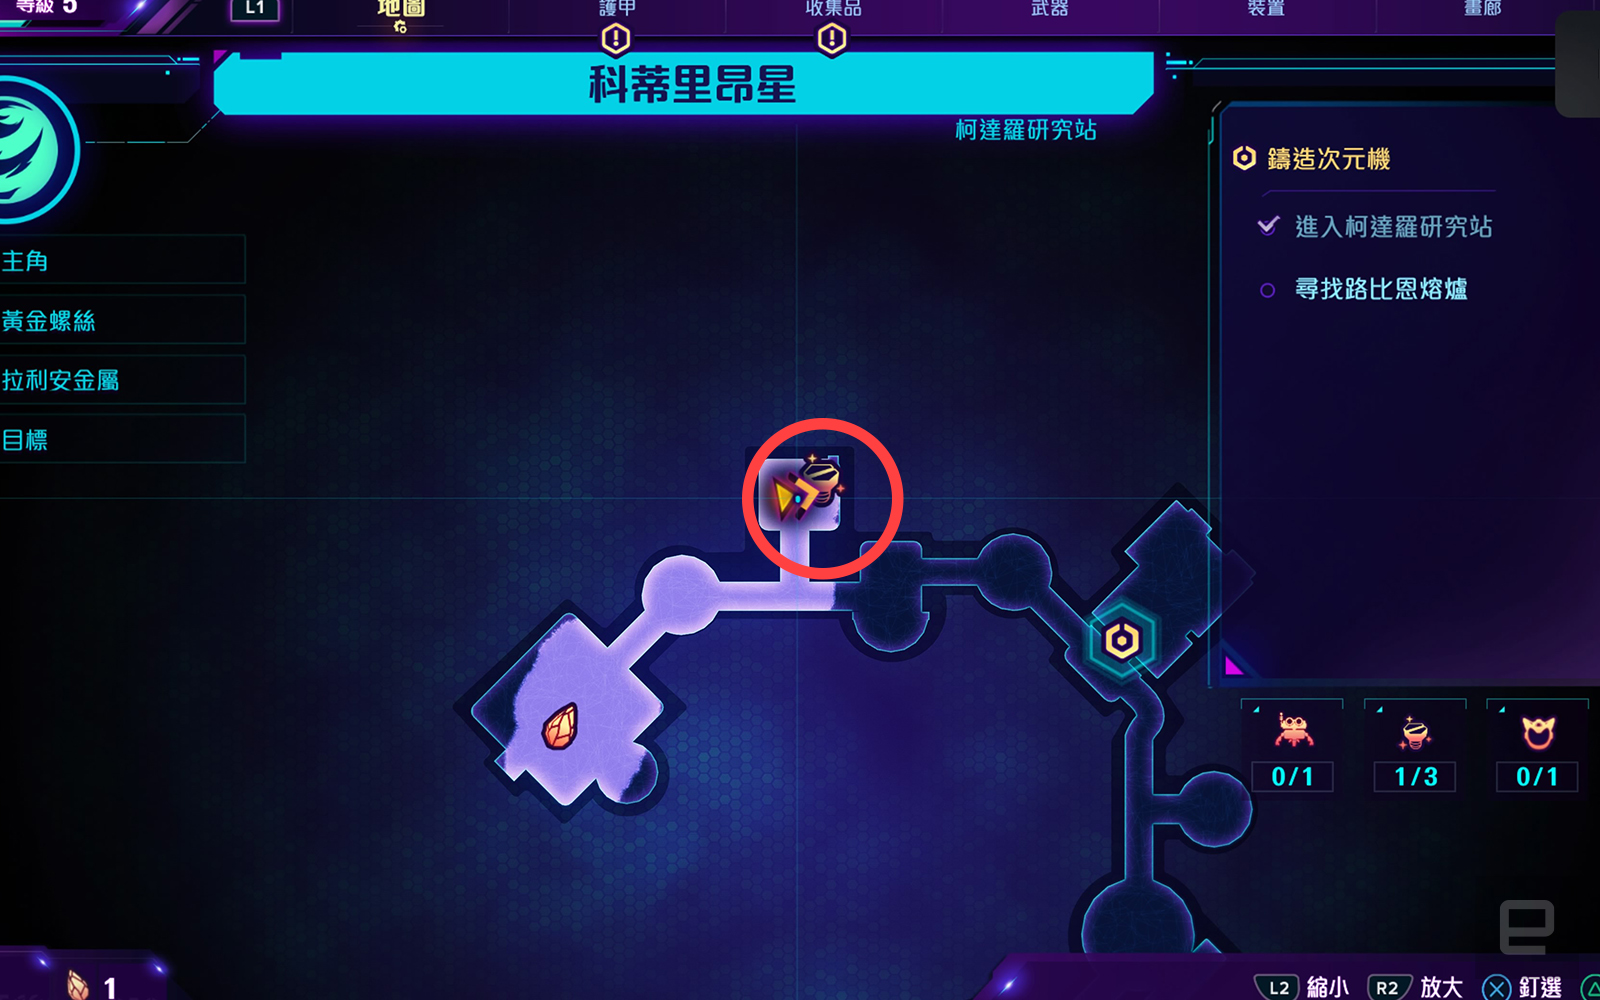 Ratchet & Clank Rift Apart Planet 7